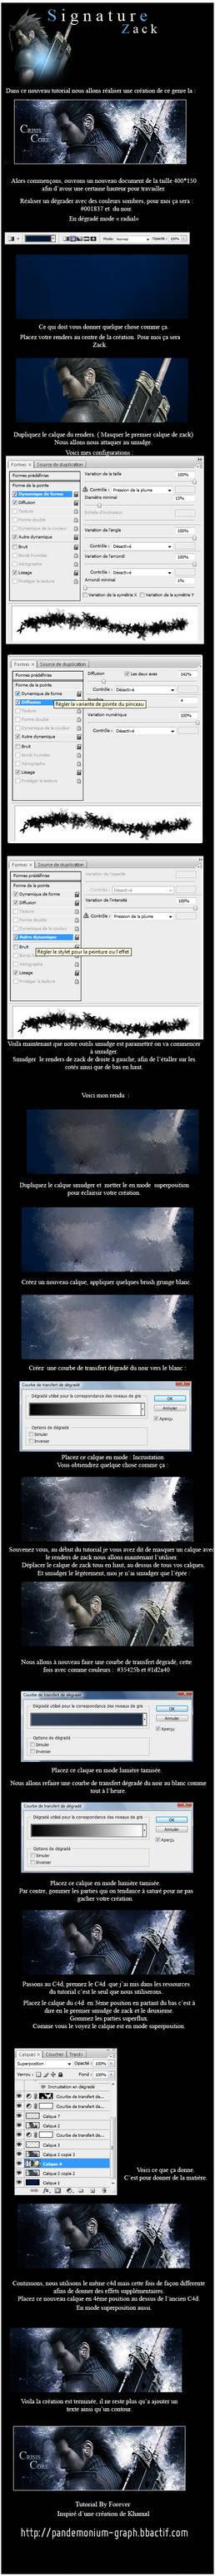 Tutoriel Debutant Photoshop -Zack- by Pandemonium-Graph